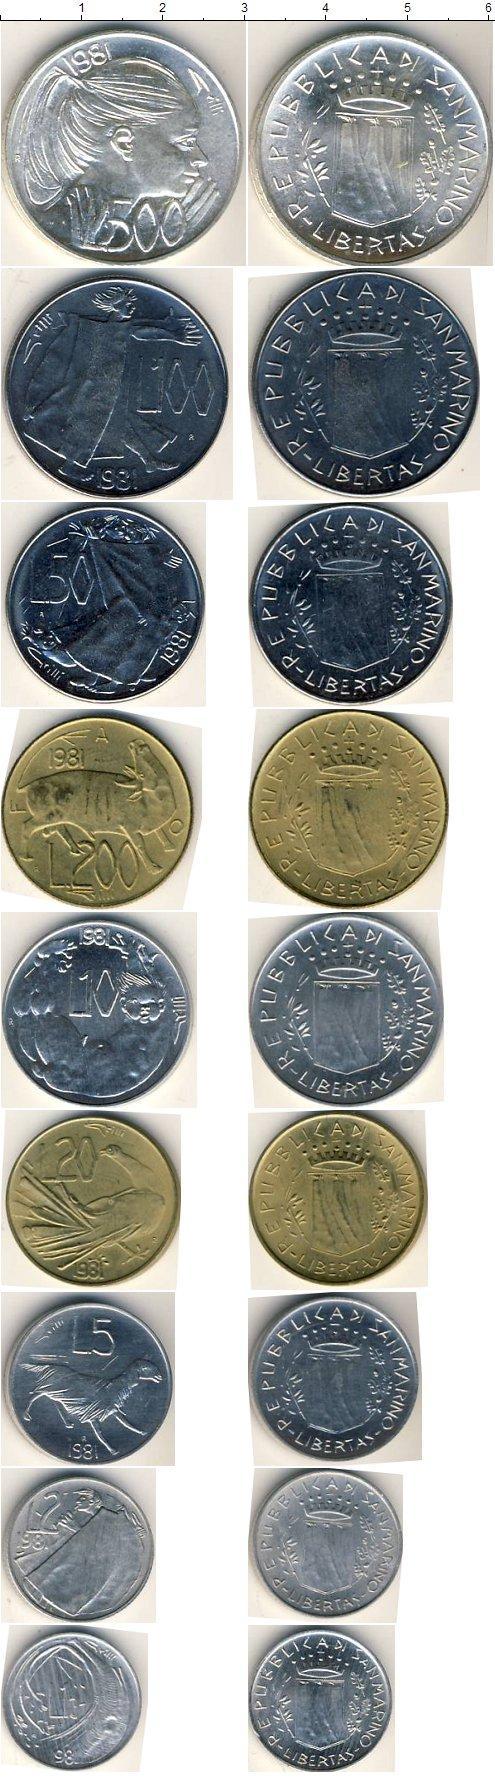 Каталог монет - Сан-Марино Сан-Марино 1981